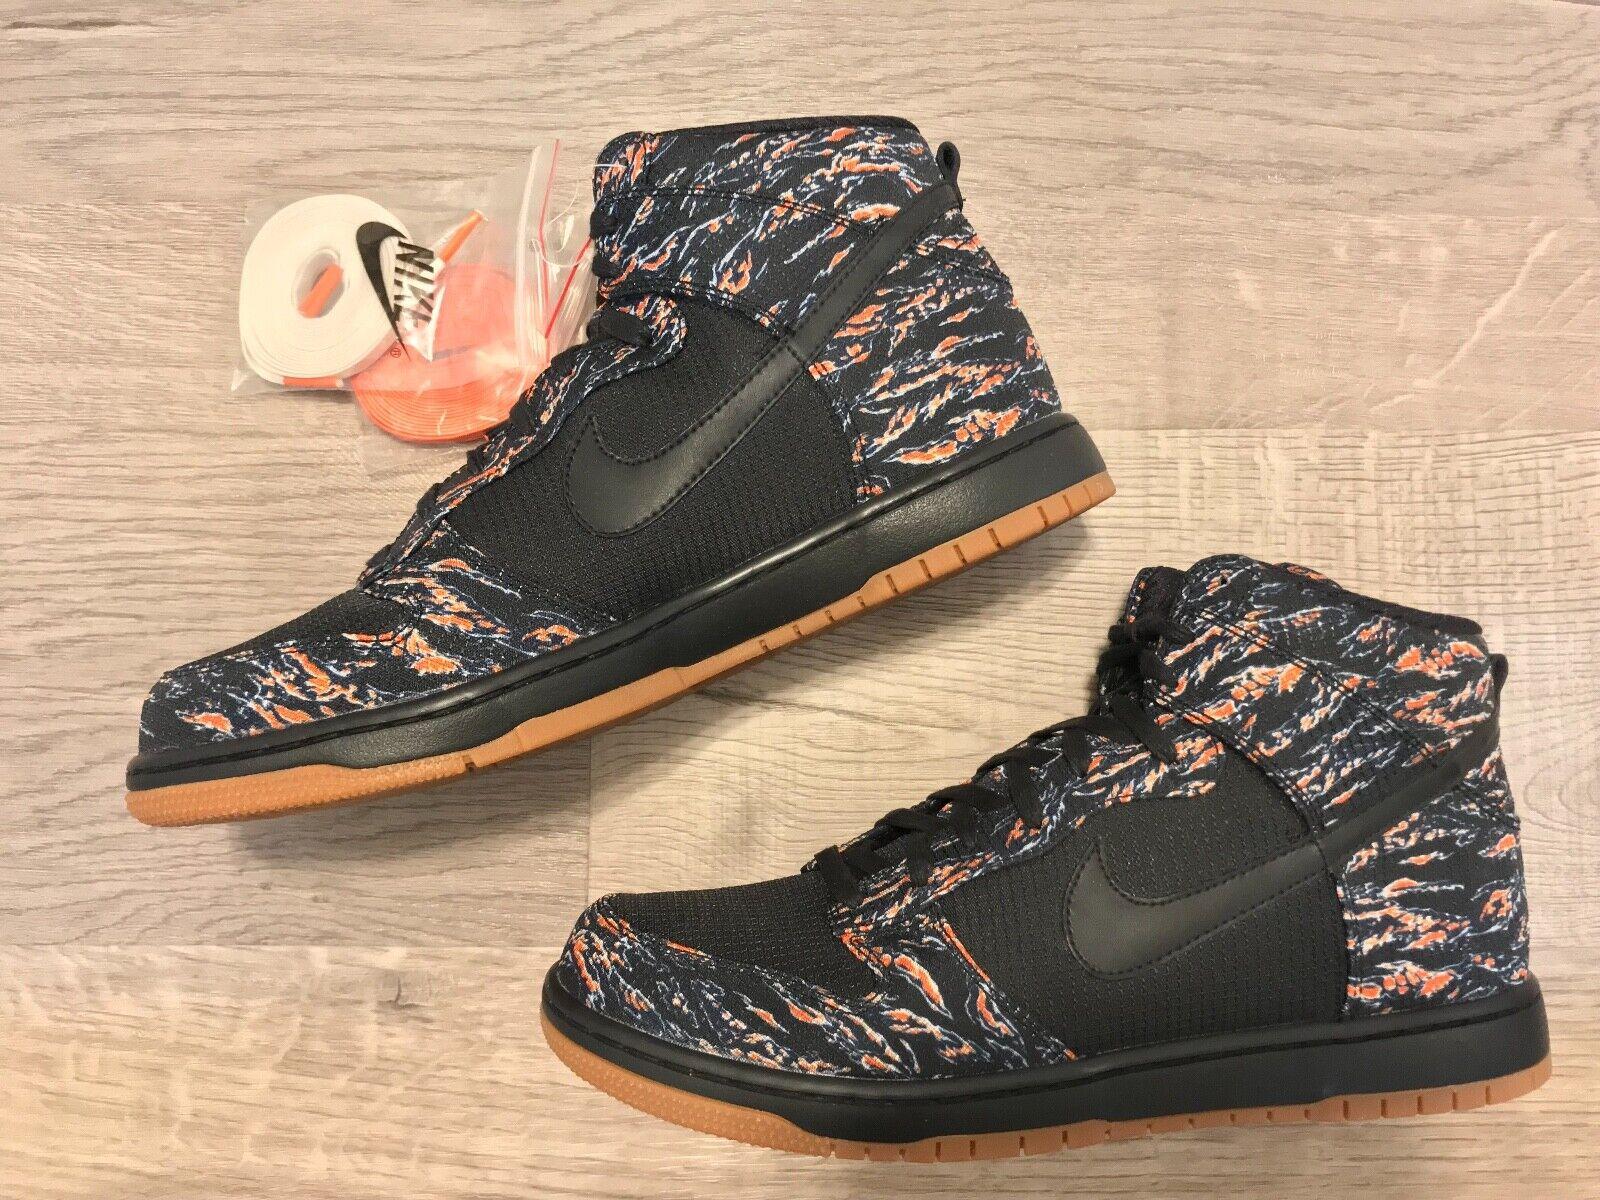 Nike Dunk High Supreme Futura x Nike - Size 11.5 - Brand New, Black, orange